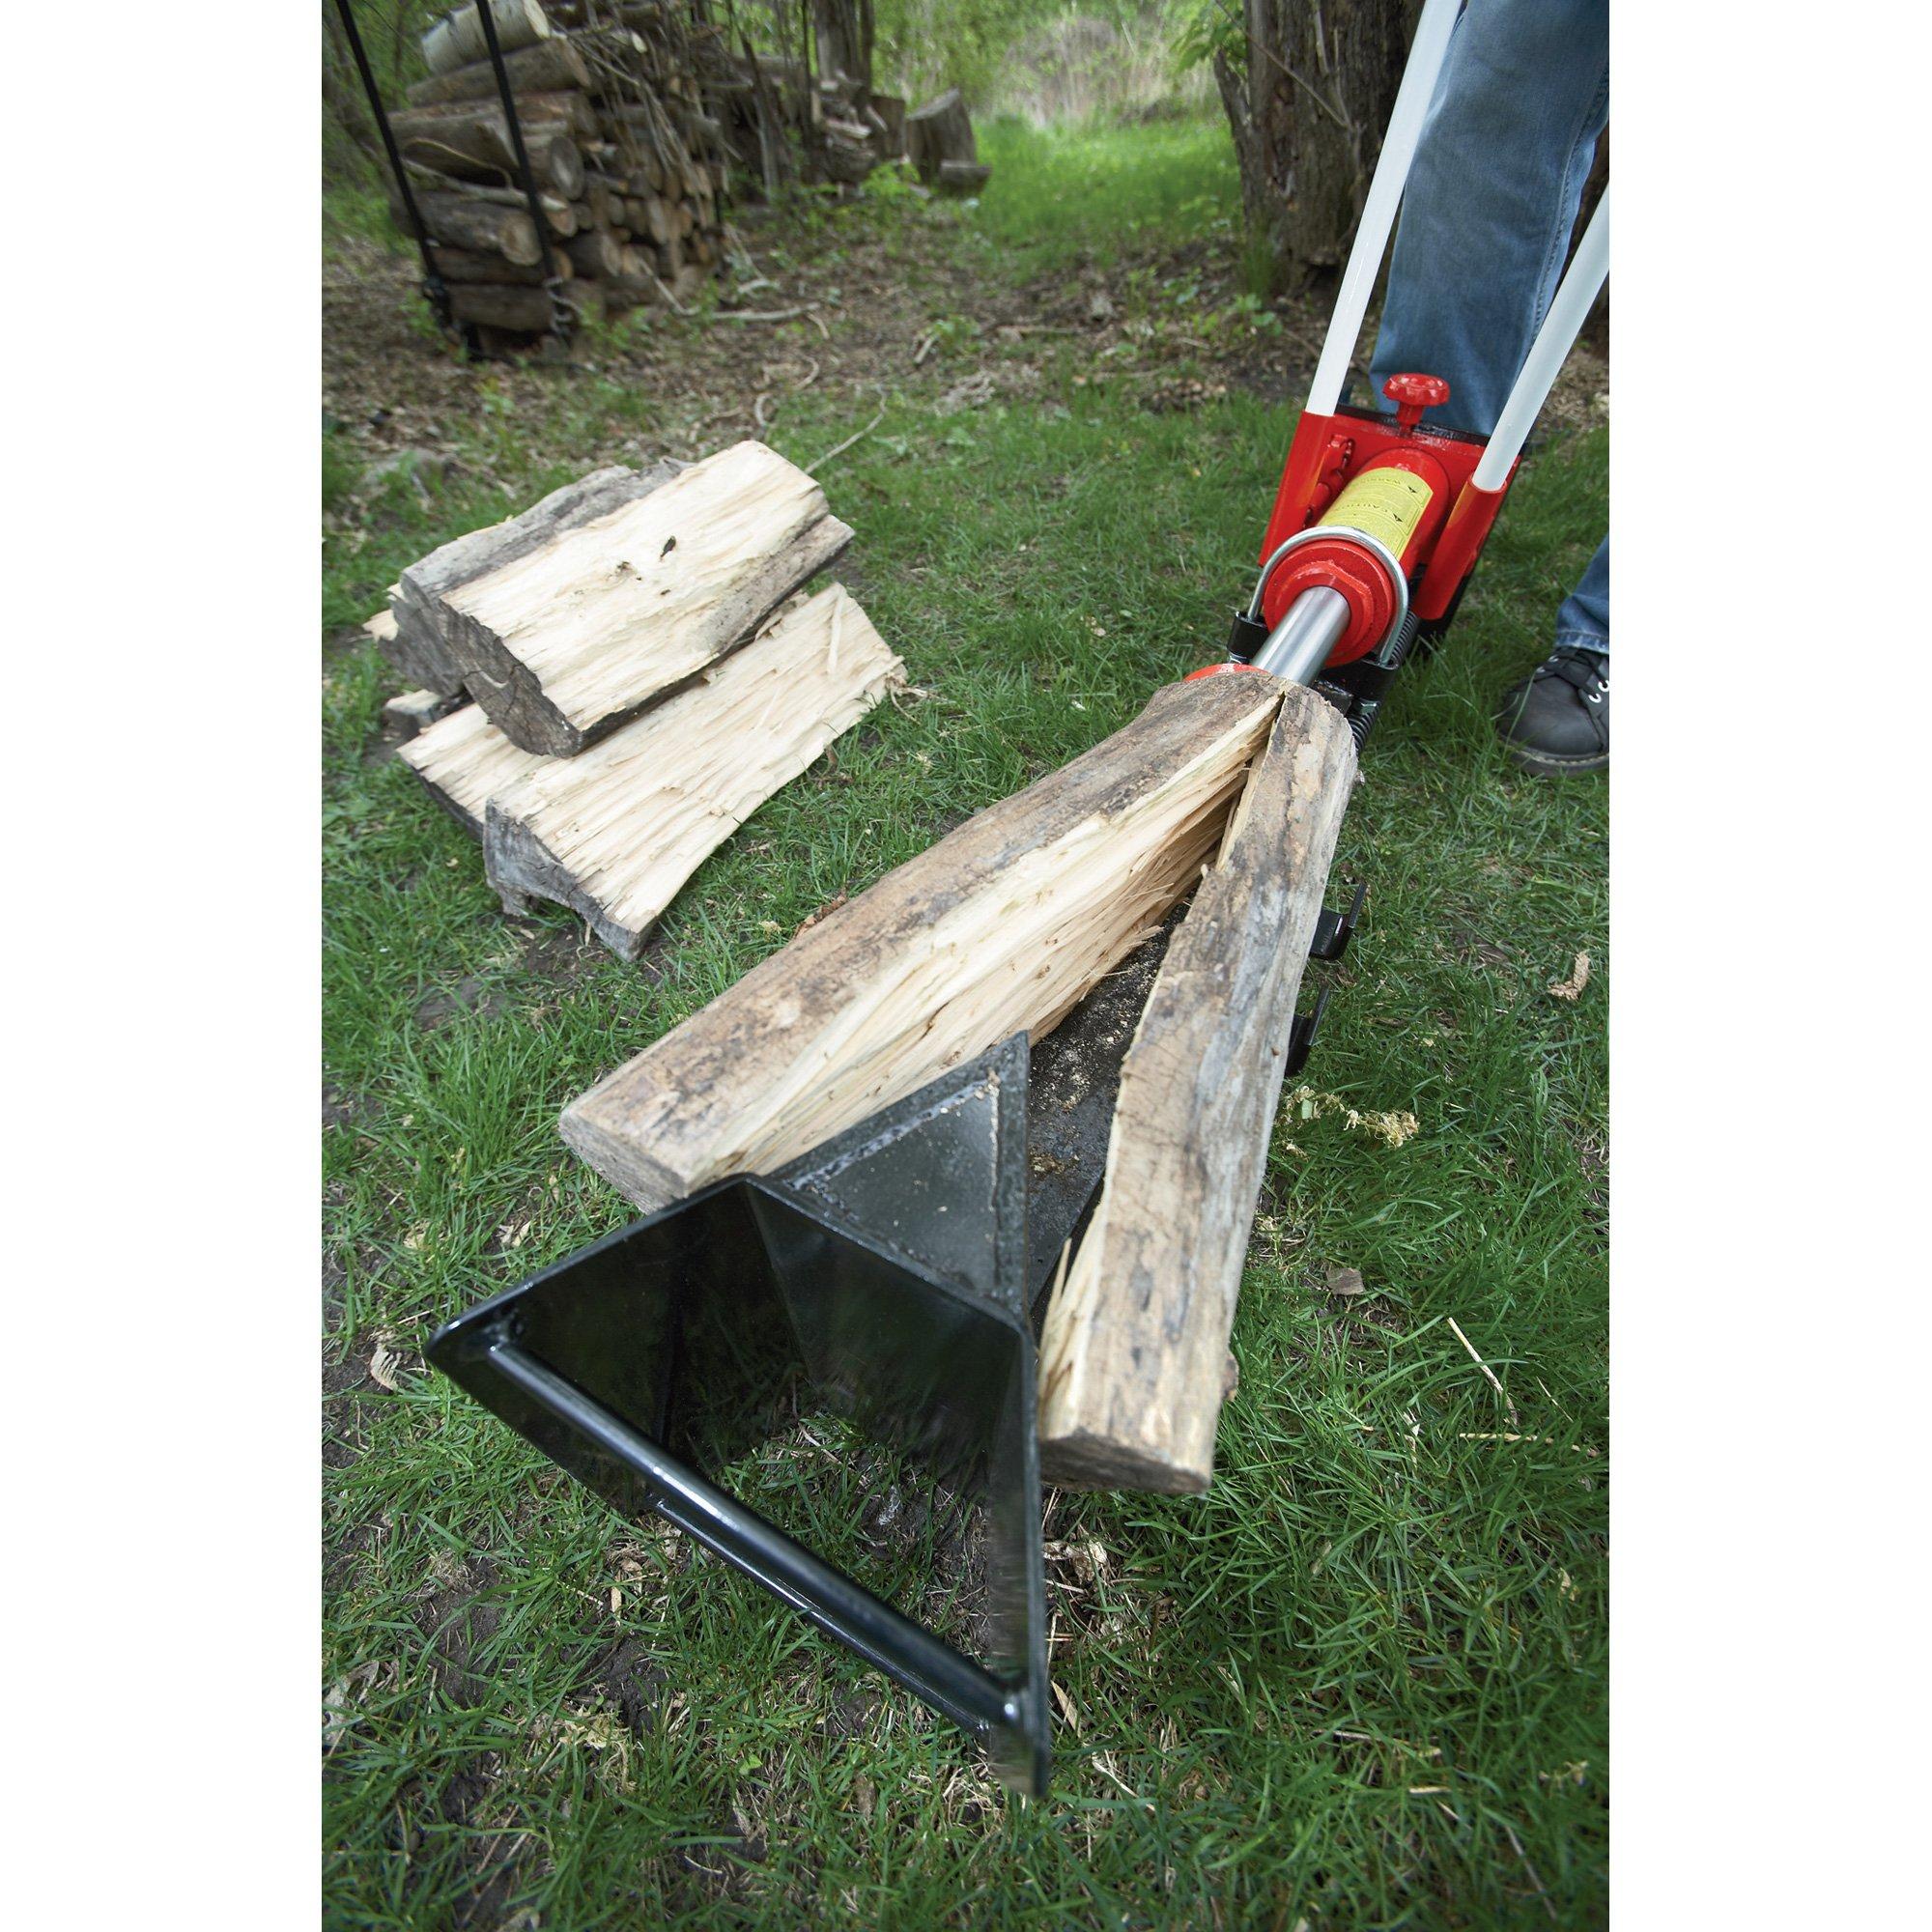 Wel-Bilt Horizontal Manual Hydraulic Log Splitter - 10-Ton